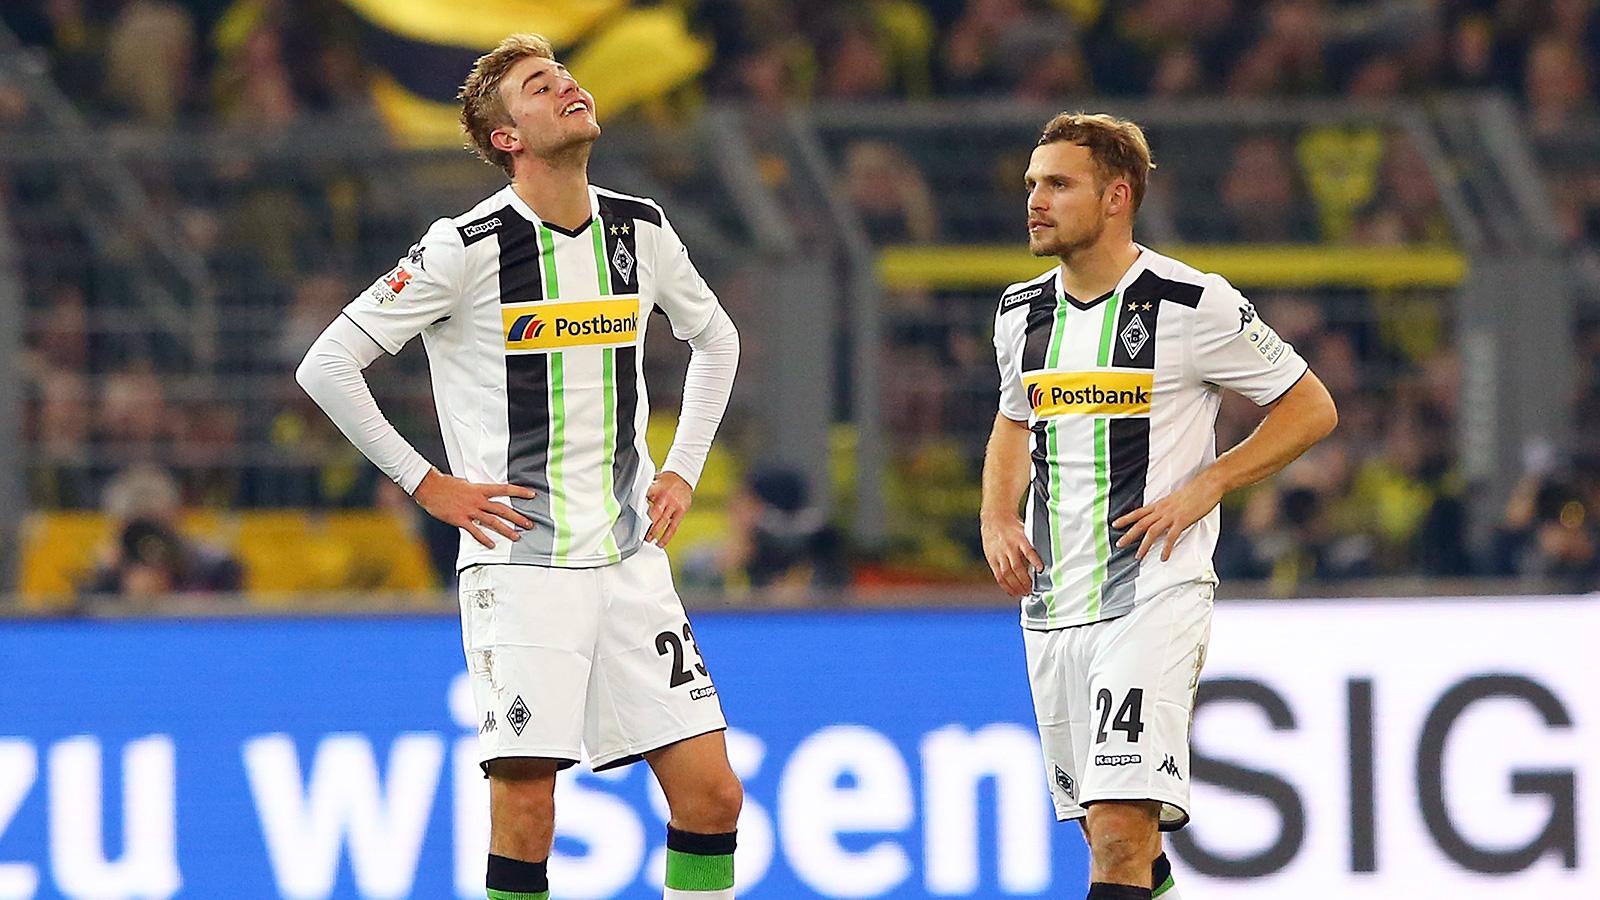 Dortmund's losing streak in Bundesliga ends on crazy own goal from halfway line (GIF)